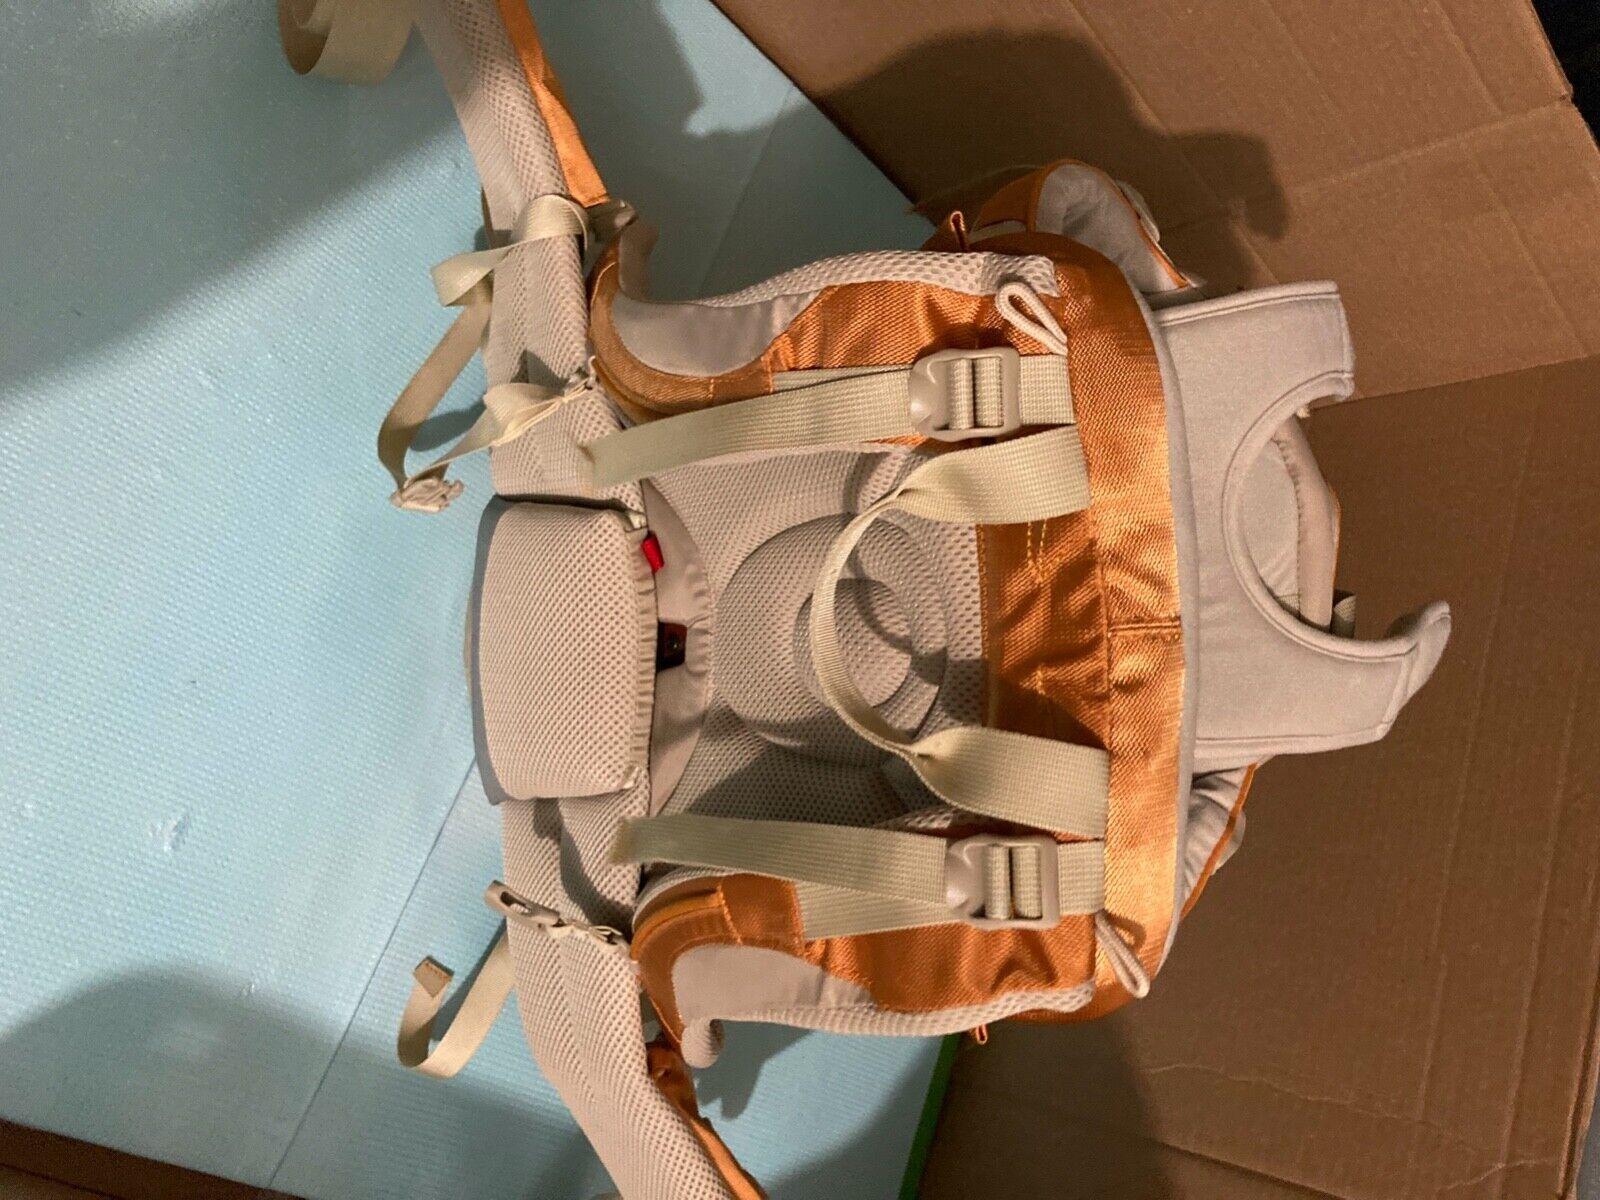 Kelty Kids TC 2.0 Baby Child Backpack Carrier Hiking Orange Beige - $29.00